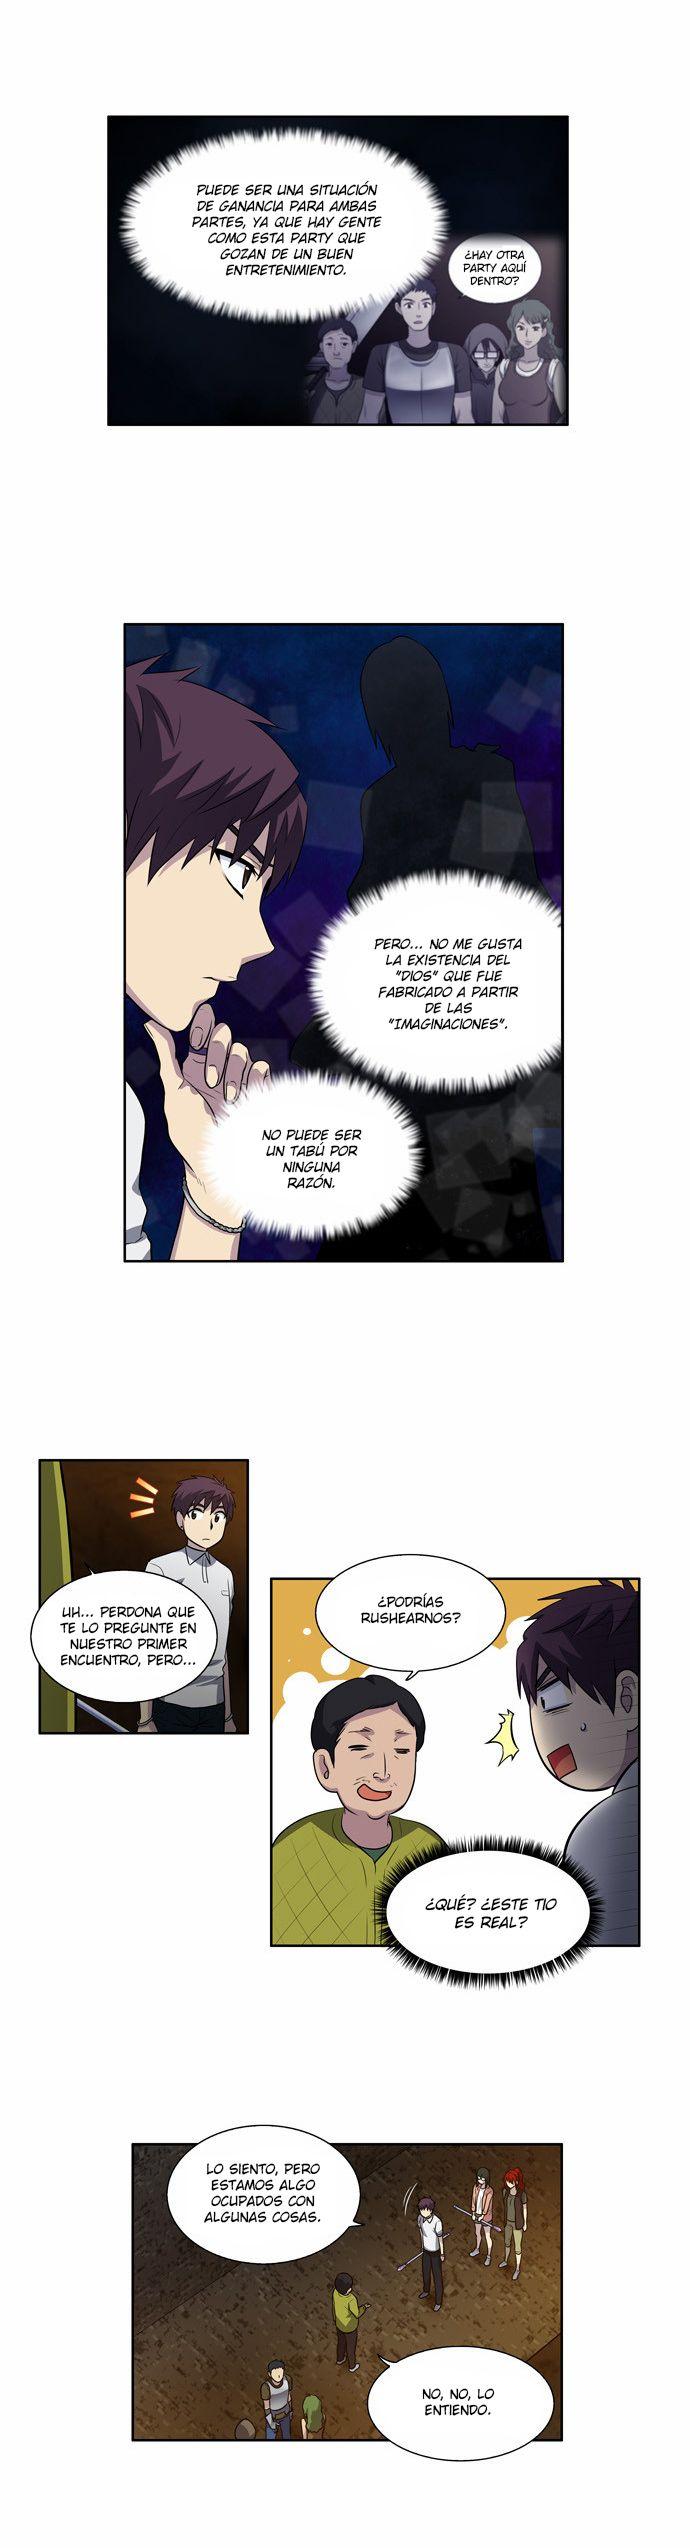 http://c5.ninemanga.com/es_manga/61/1725/482105/641e167f974d1dd076c0886d17271975.jpg Page 8